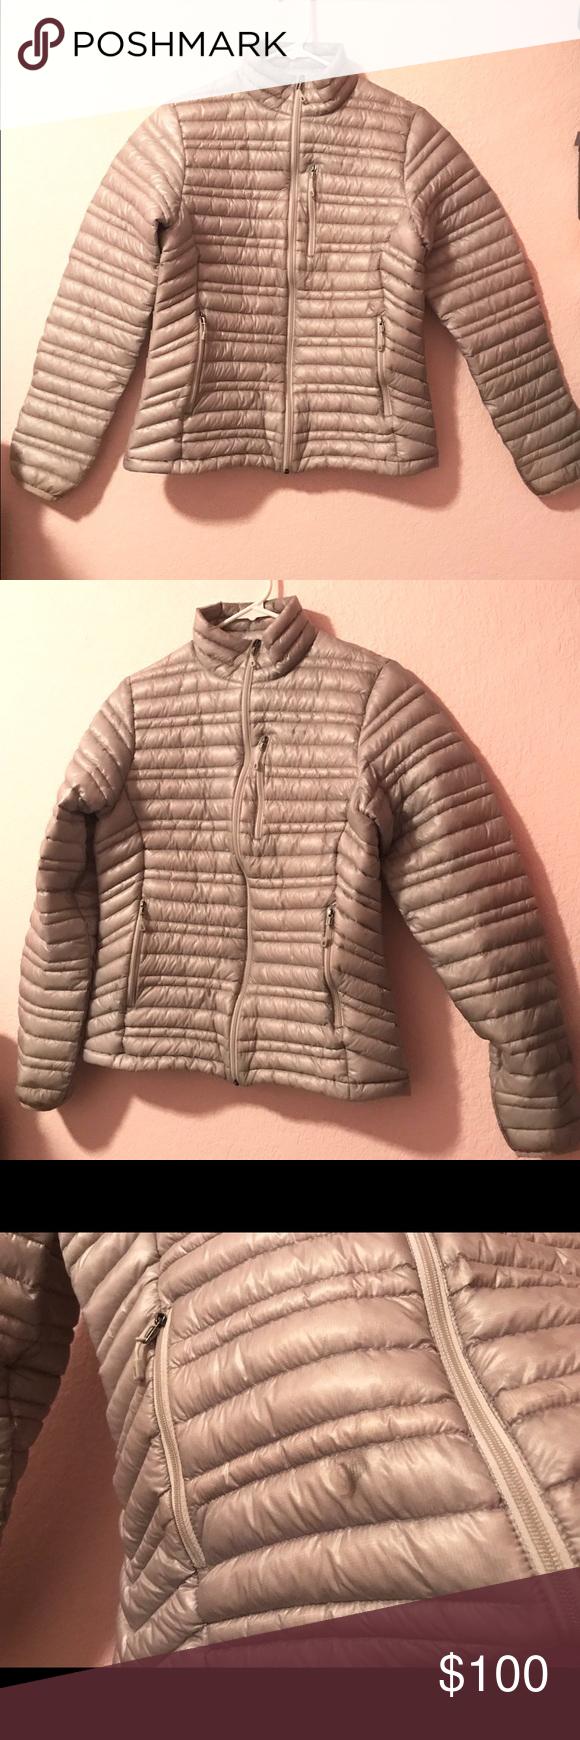 Women's Patagonia 'Ultralight' Down Puff Jacket S